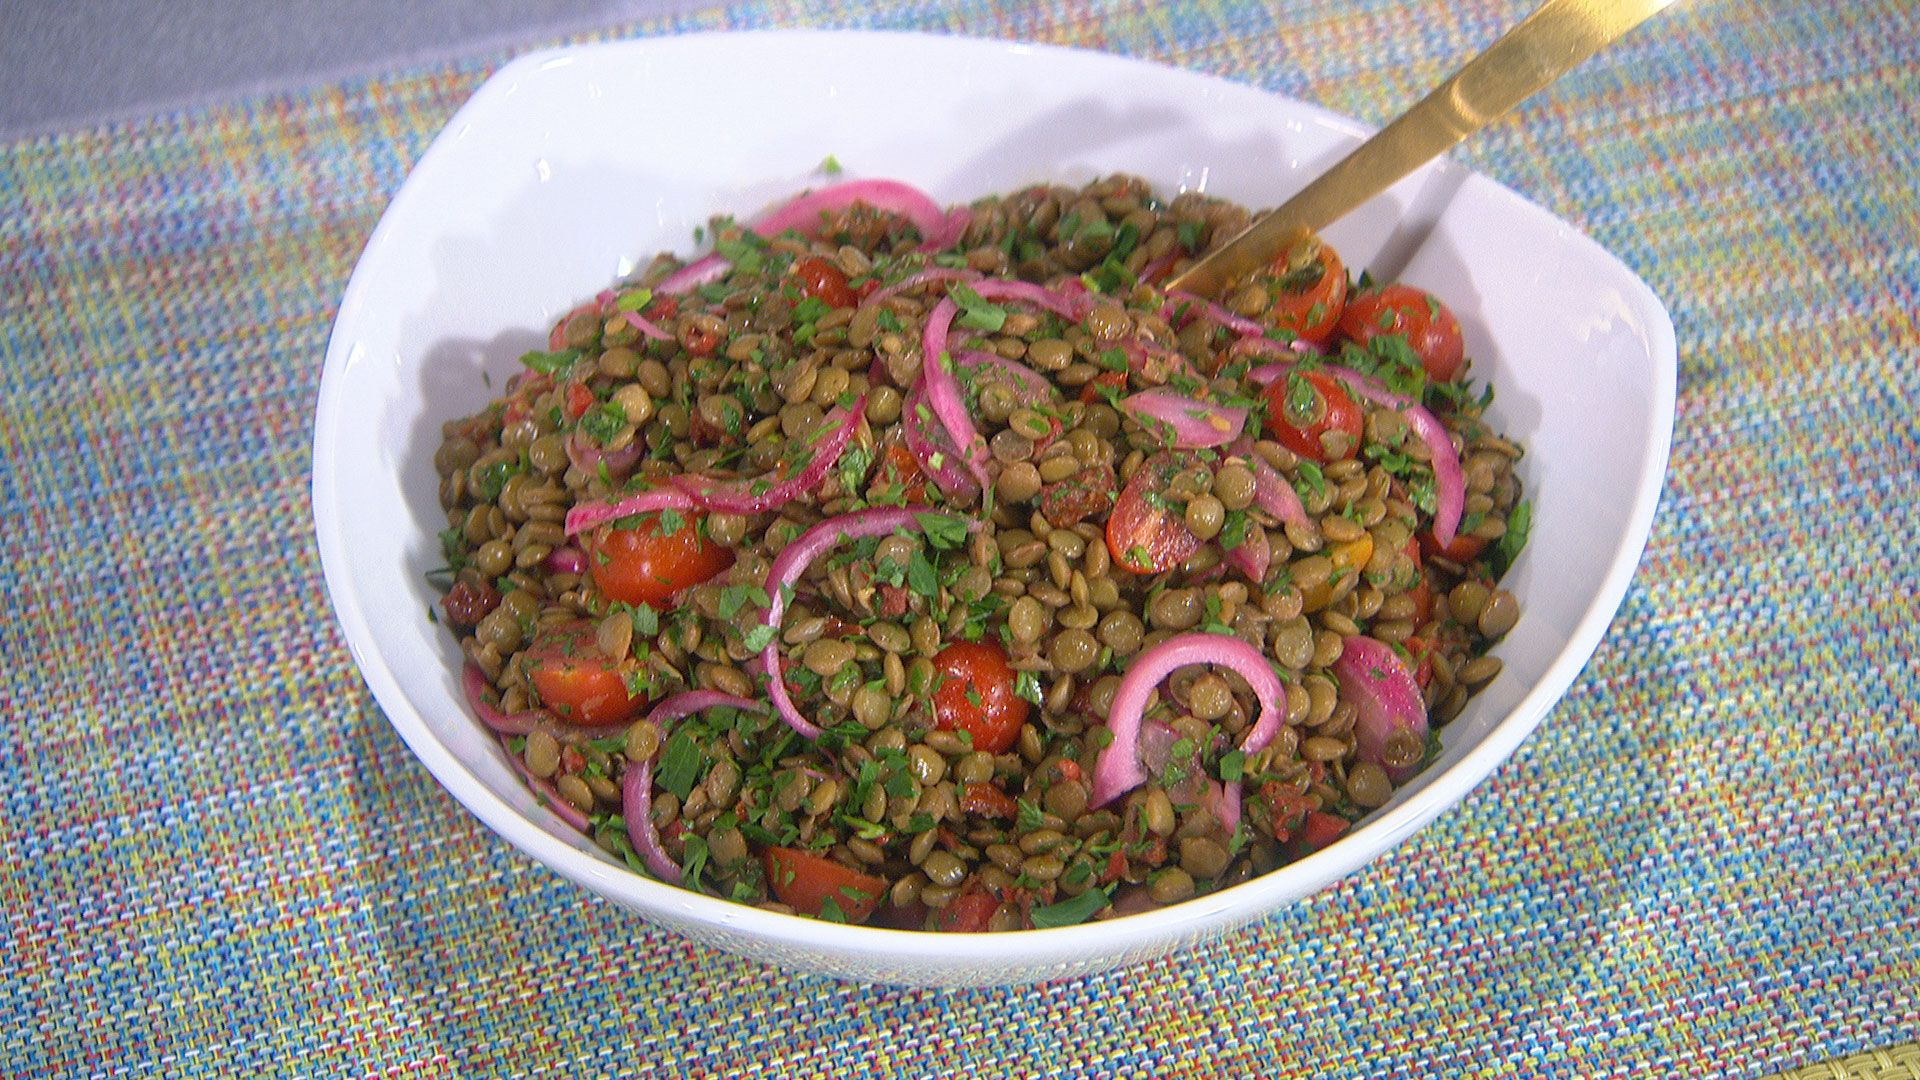 Marisa Churchill Recipes - The Talk - CBS.com -- Liv liked the looks of the Mediterranean Lentil Salad...